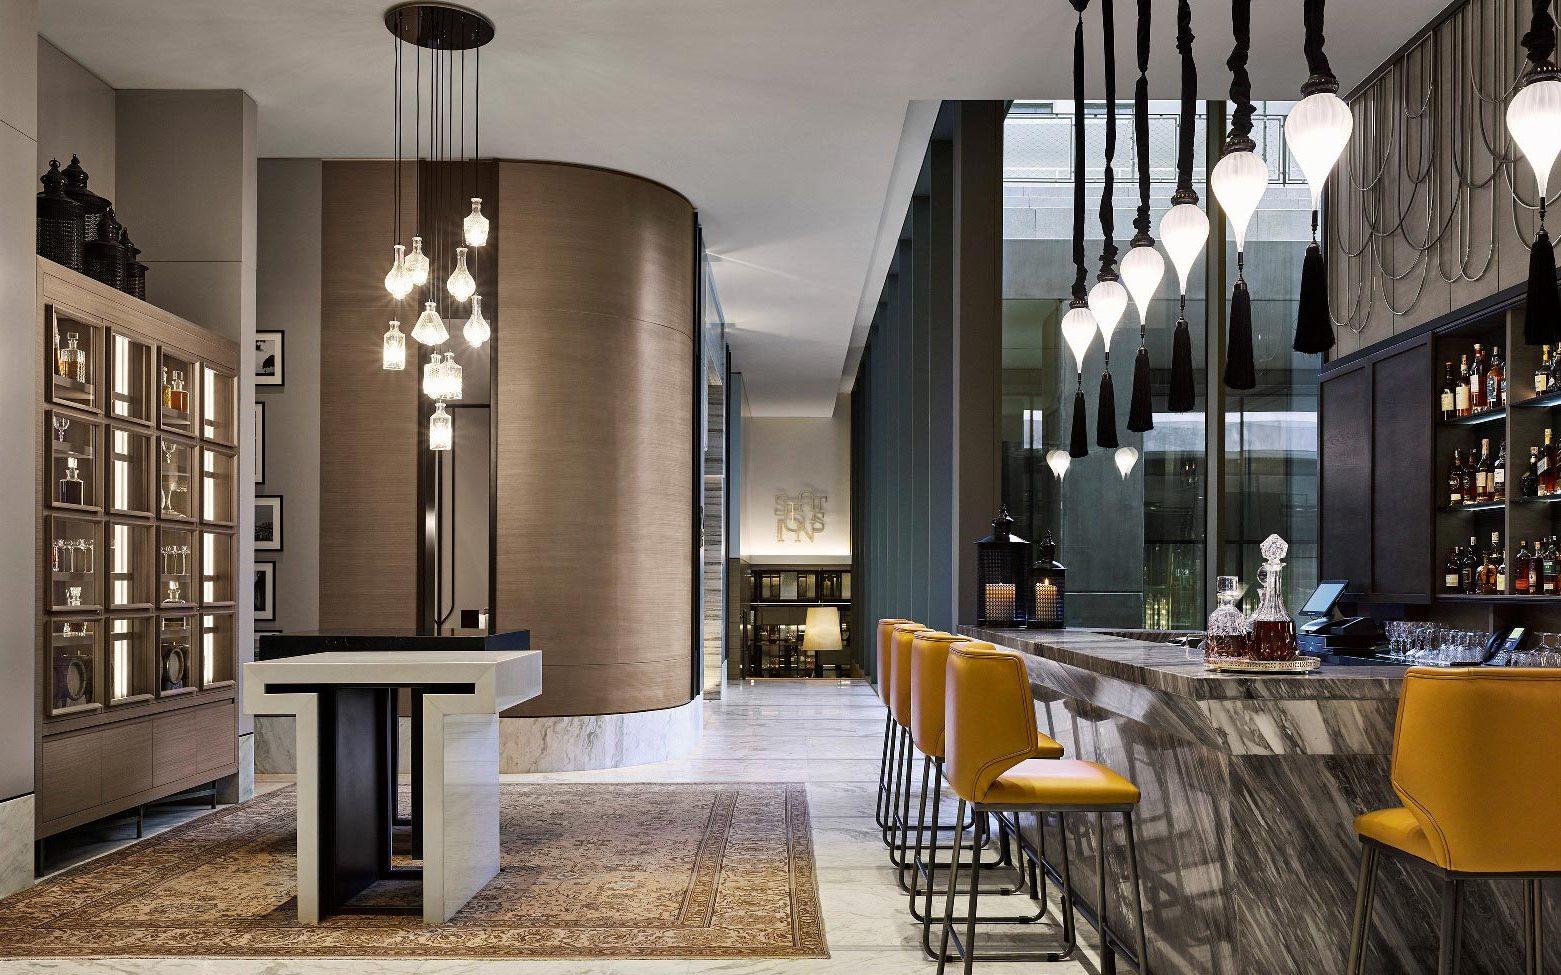 Superior Wilson Associates Fairmont Quasar Istanbul Design Project Images For SBID Interior  Design Blog, Project Of